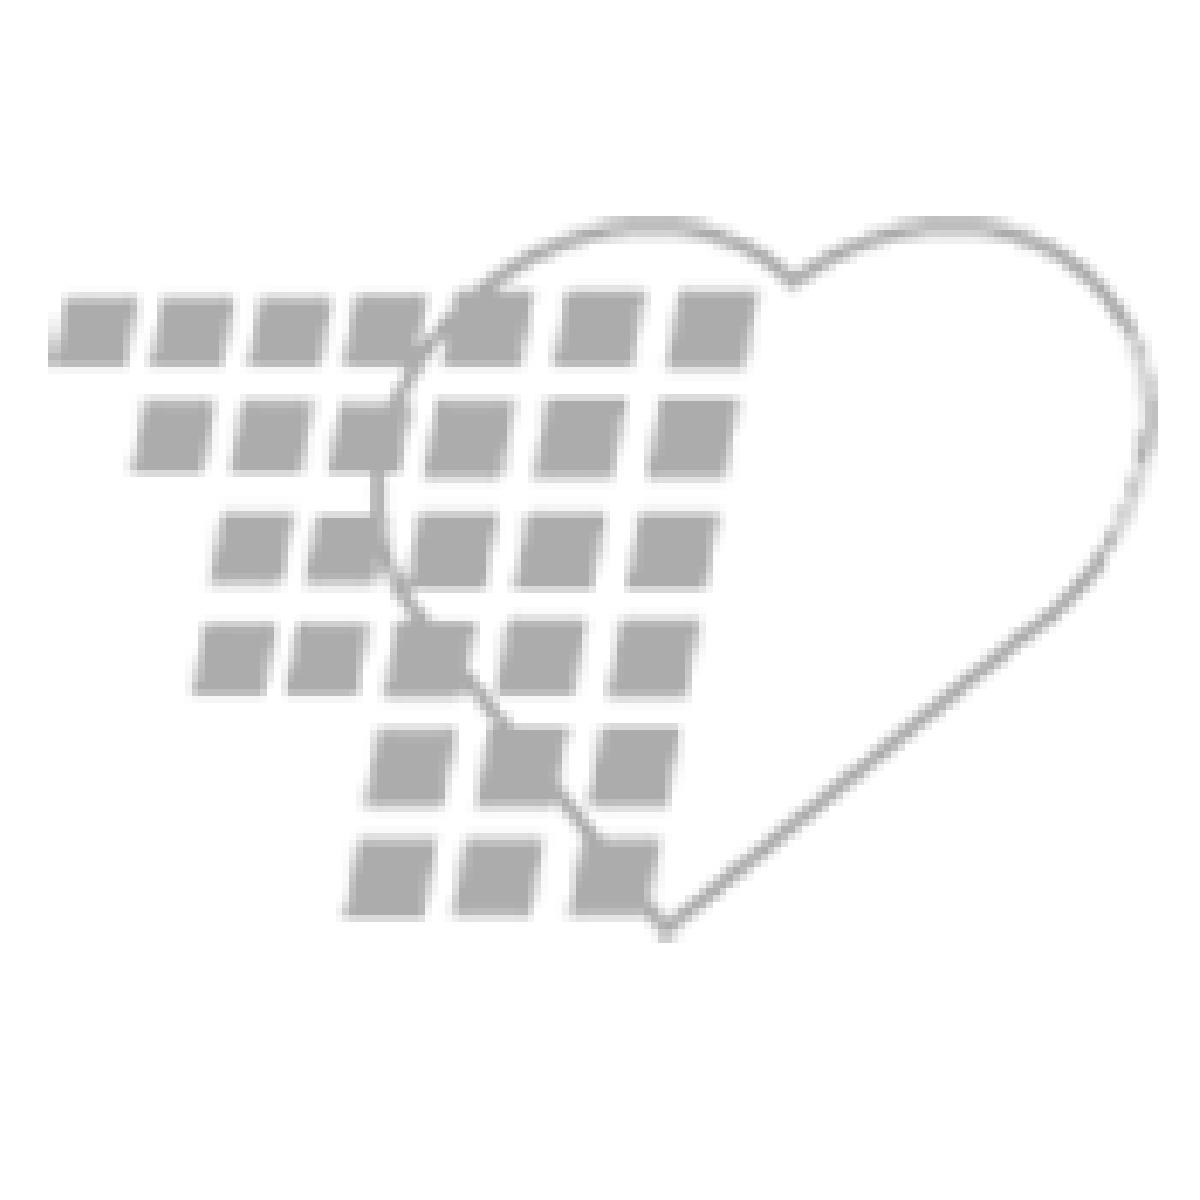 06-93-6927 Demo Dose® Midazolm Versd 1 mg mL 2 mL